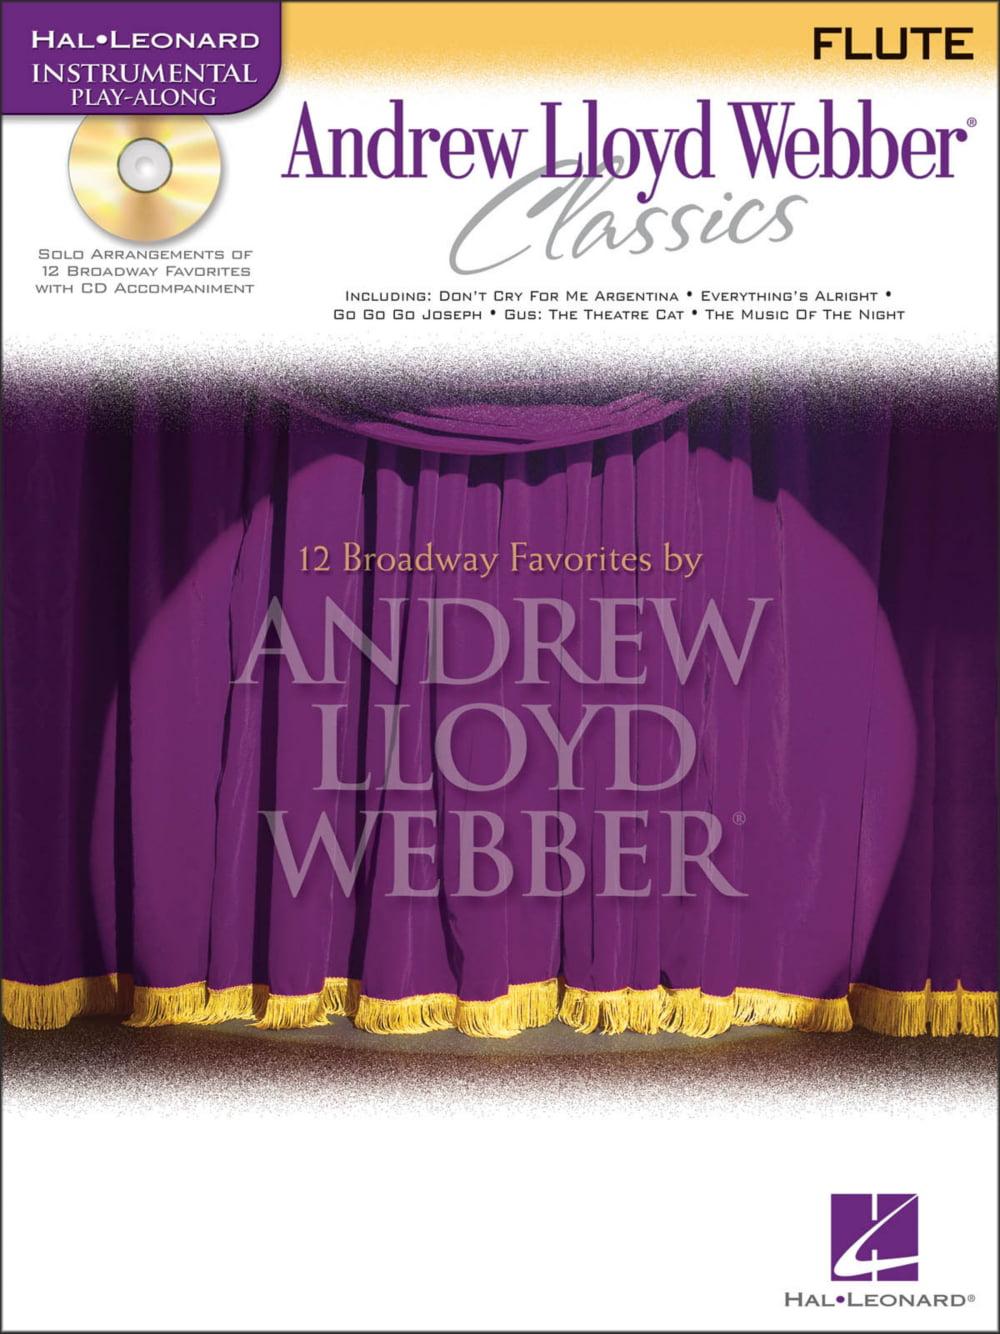 Hal Leonard Andrew Lloyd Webber Classics for Flute Book CD by